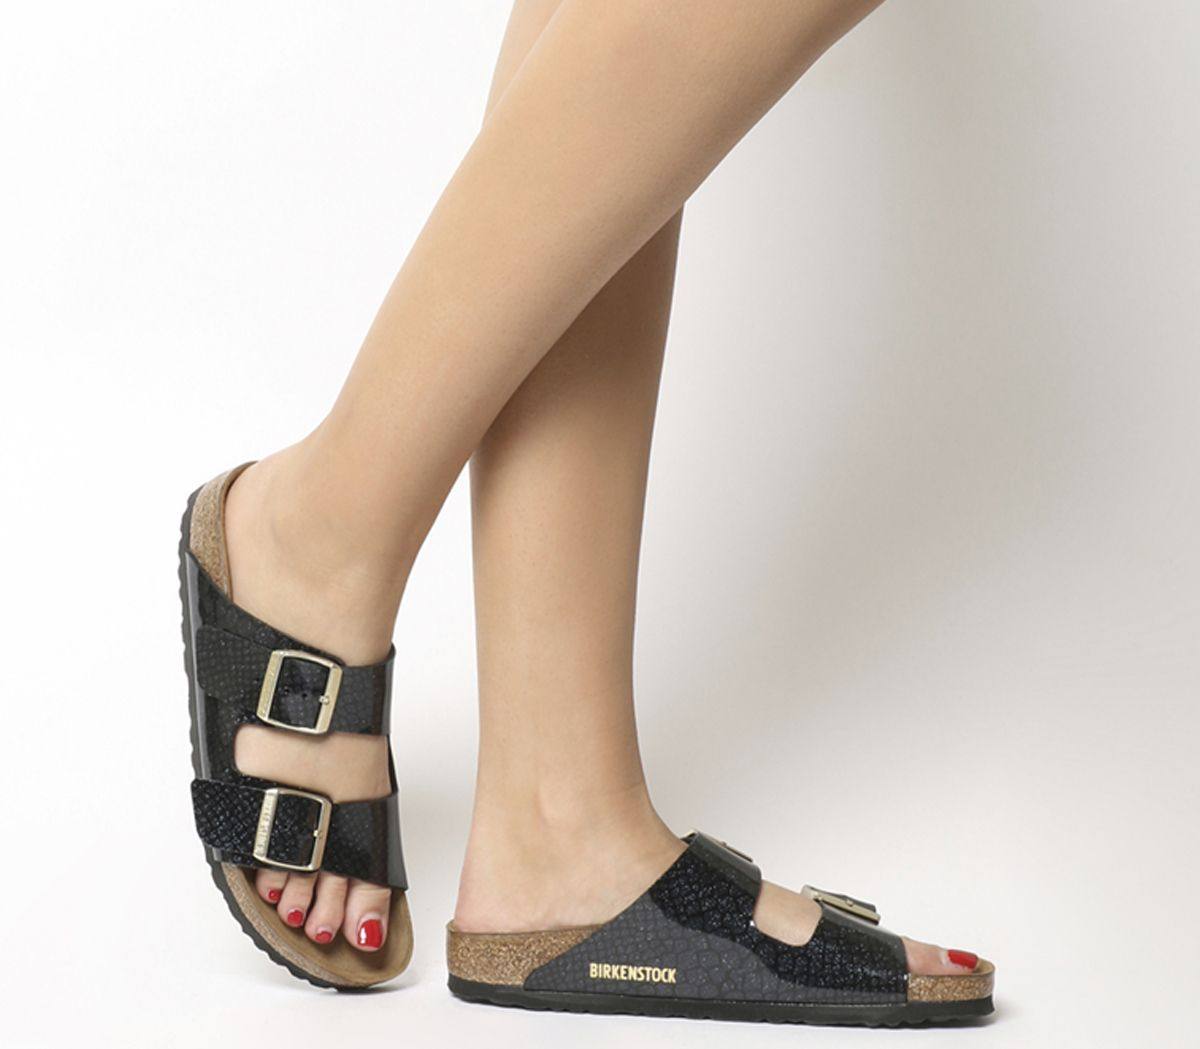 00413f541f4 Birkenstock Arizona Two Strap Sandals Magic Snake Black - Sandals